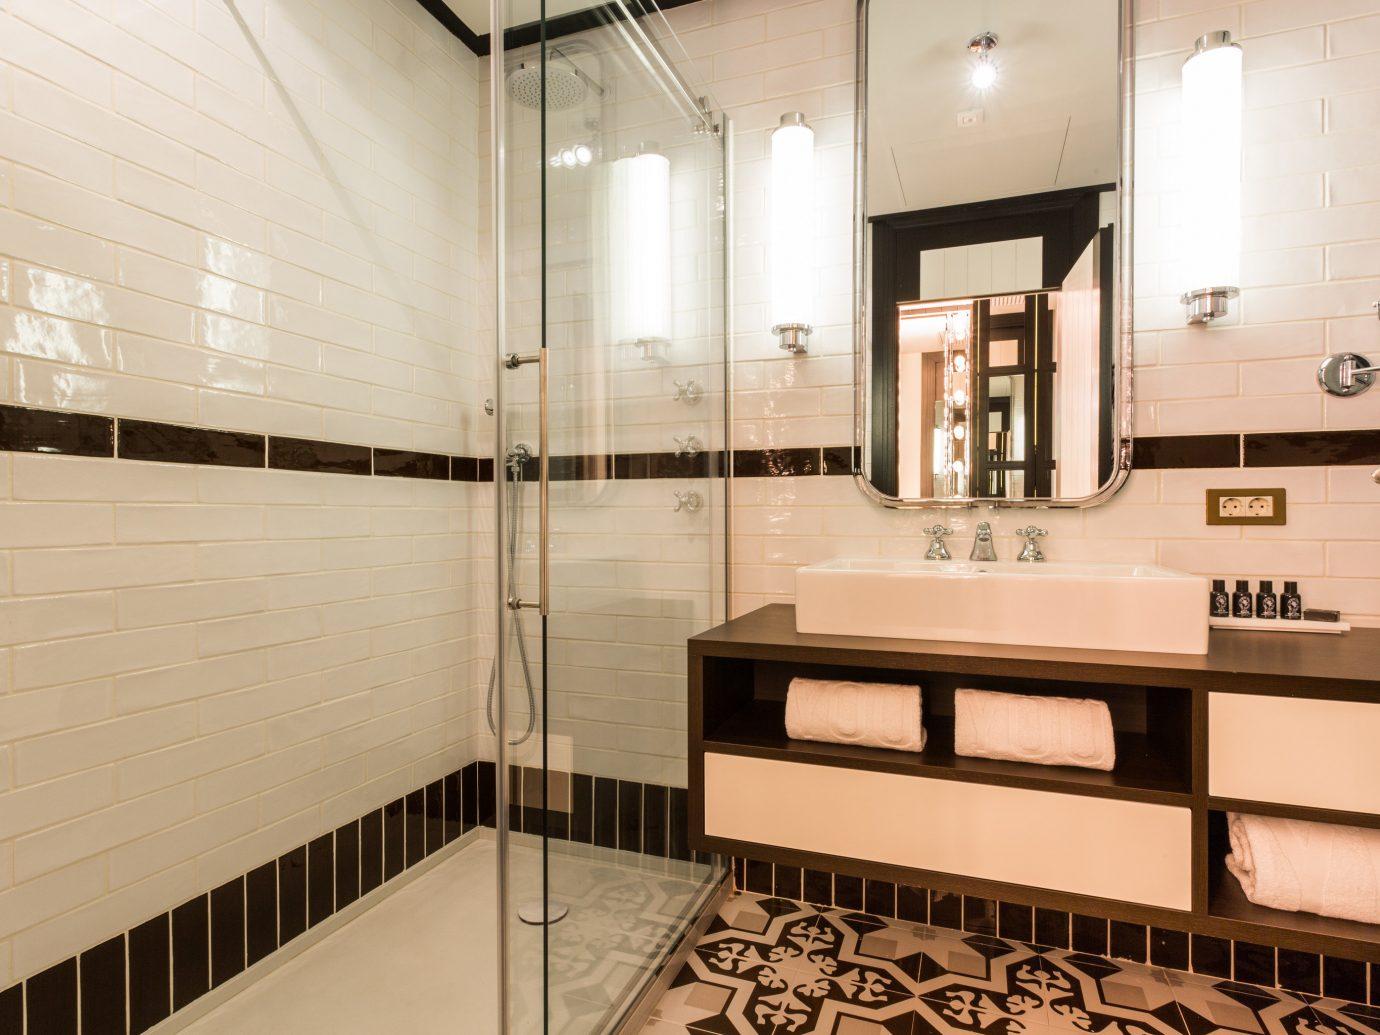 Hotels Madrid Spain indoor floor room property interior design home estate Design lighting bathroom Kitchen flooring apartment tiled tile